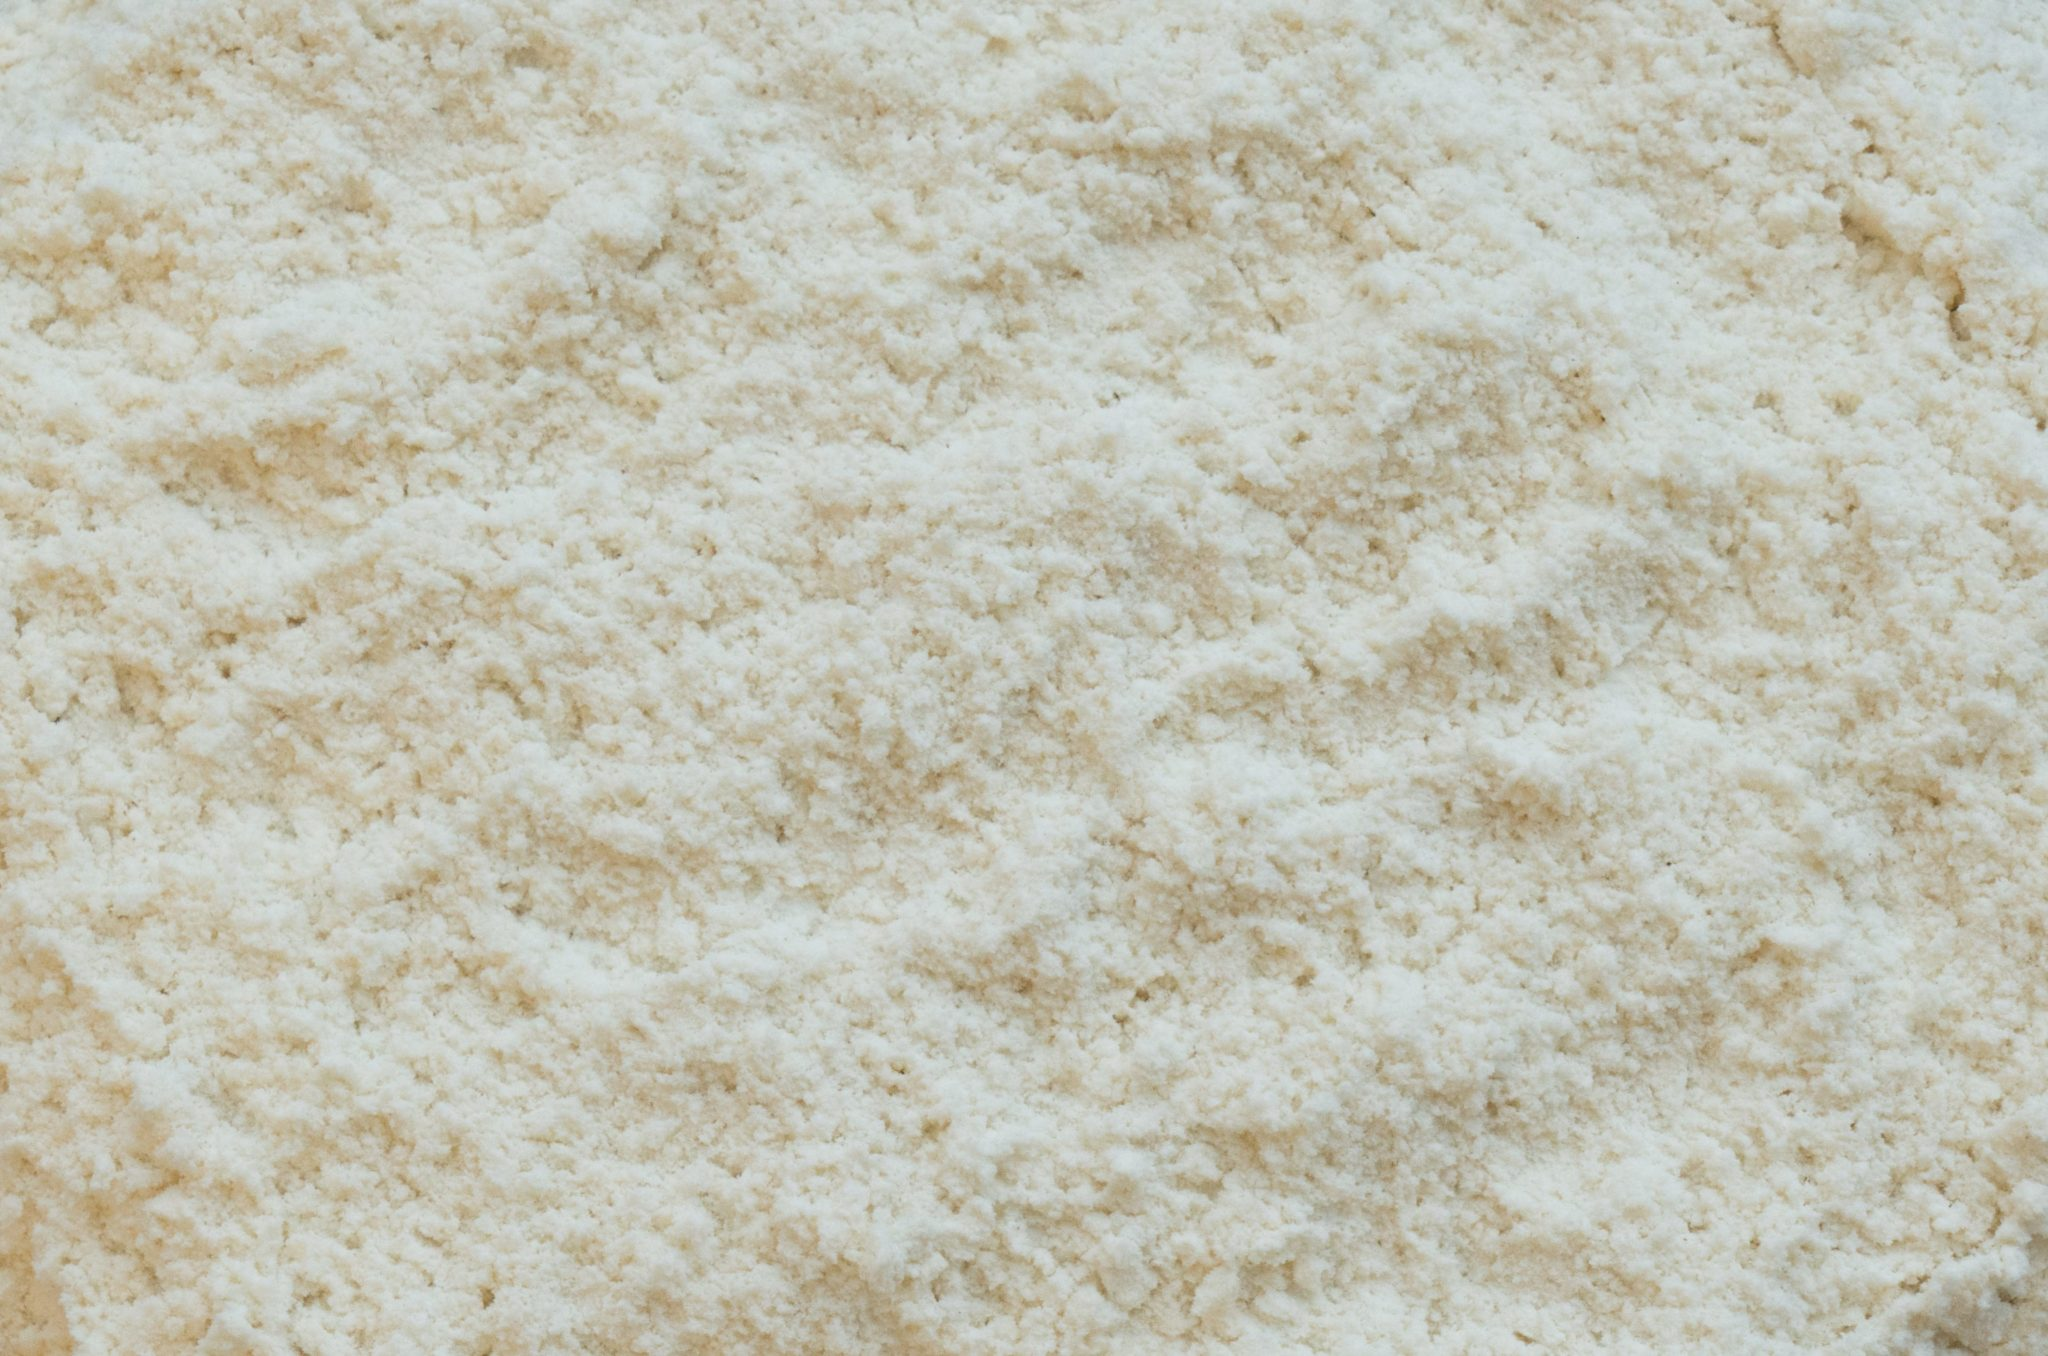 Organic All Purpose Unbleached White Flour